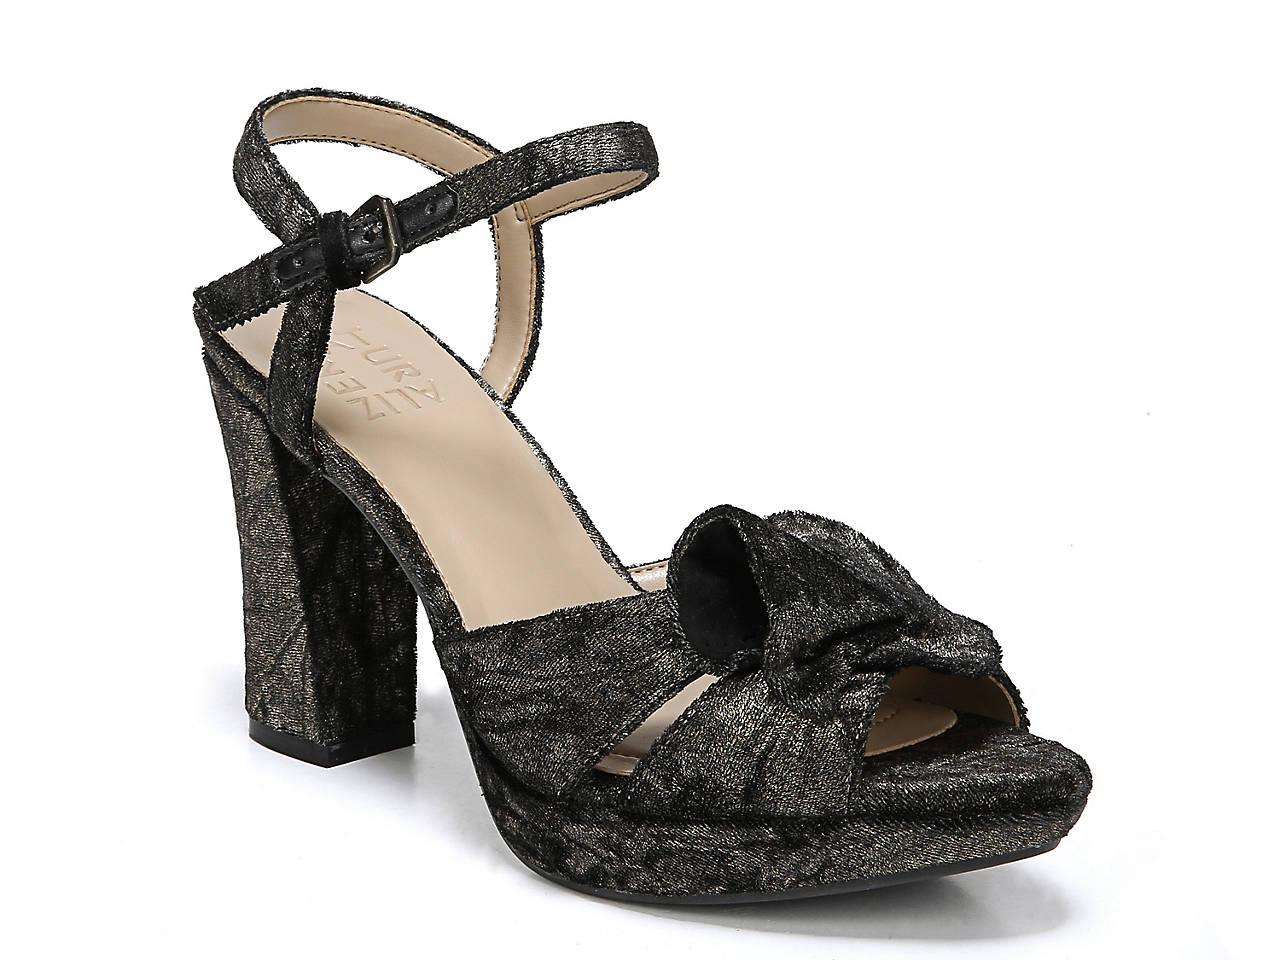 dd88134659d3 Naturalizer Adelle Platform Sandal Women s Shoes